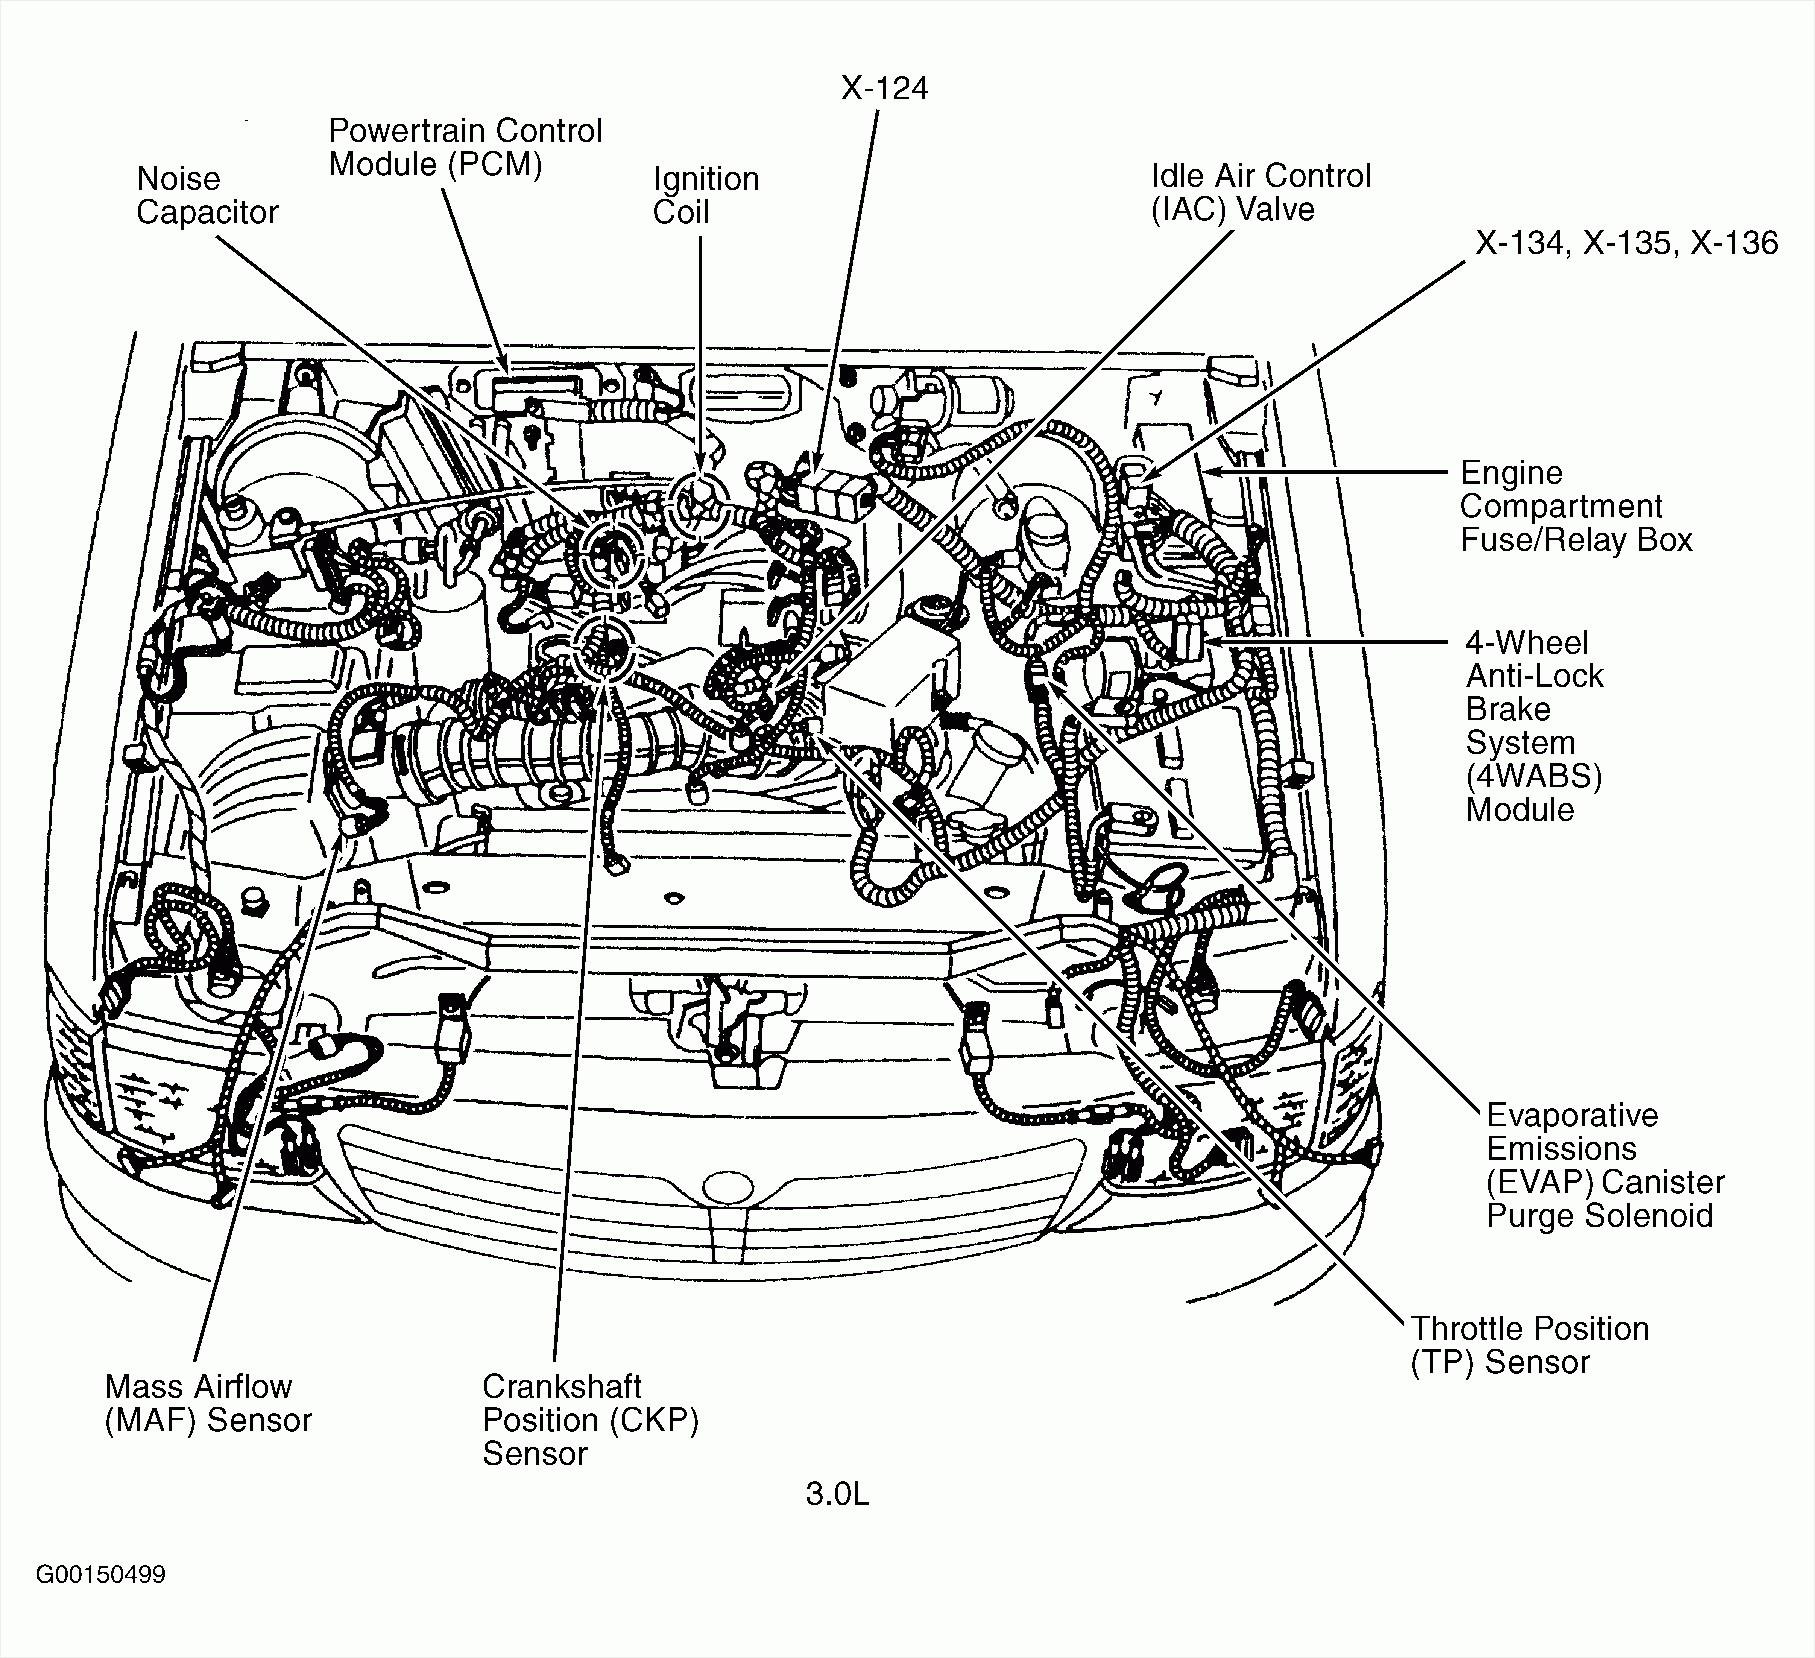 2004 Ford Taurus Engine Diagram - Wiring Diagrams Data